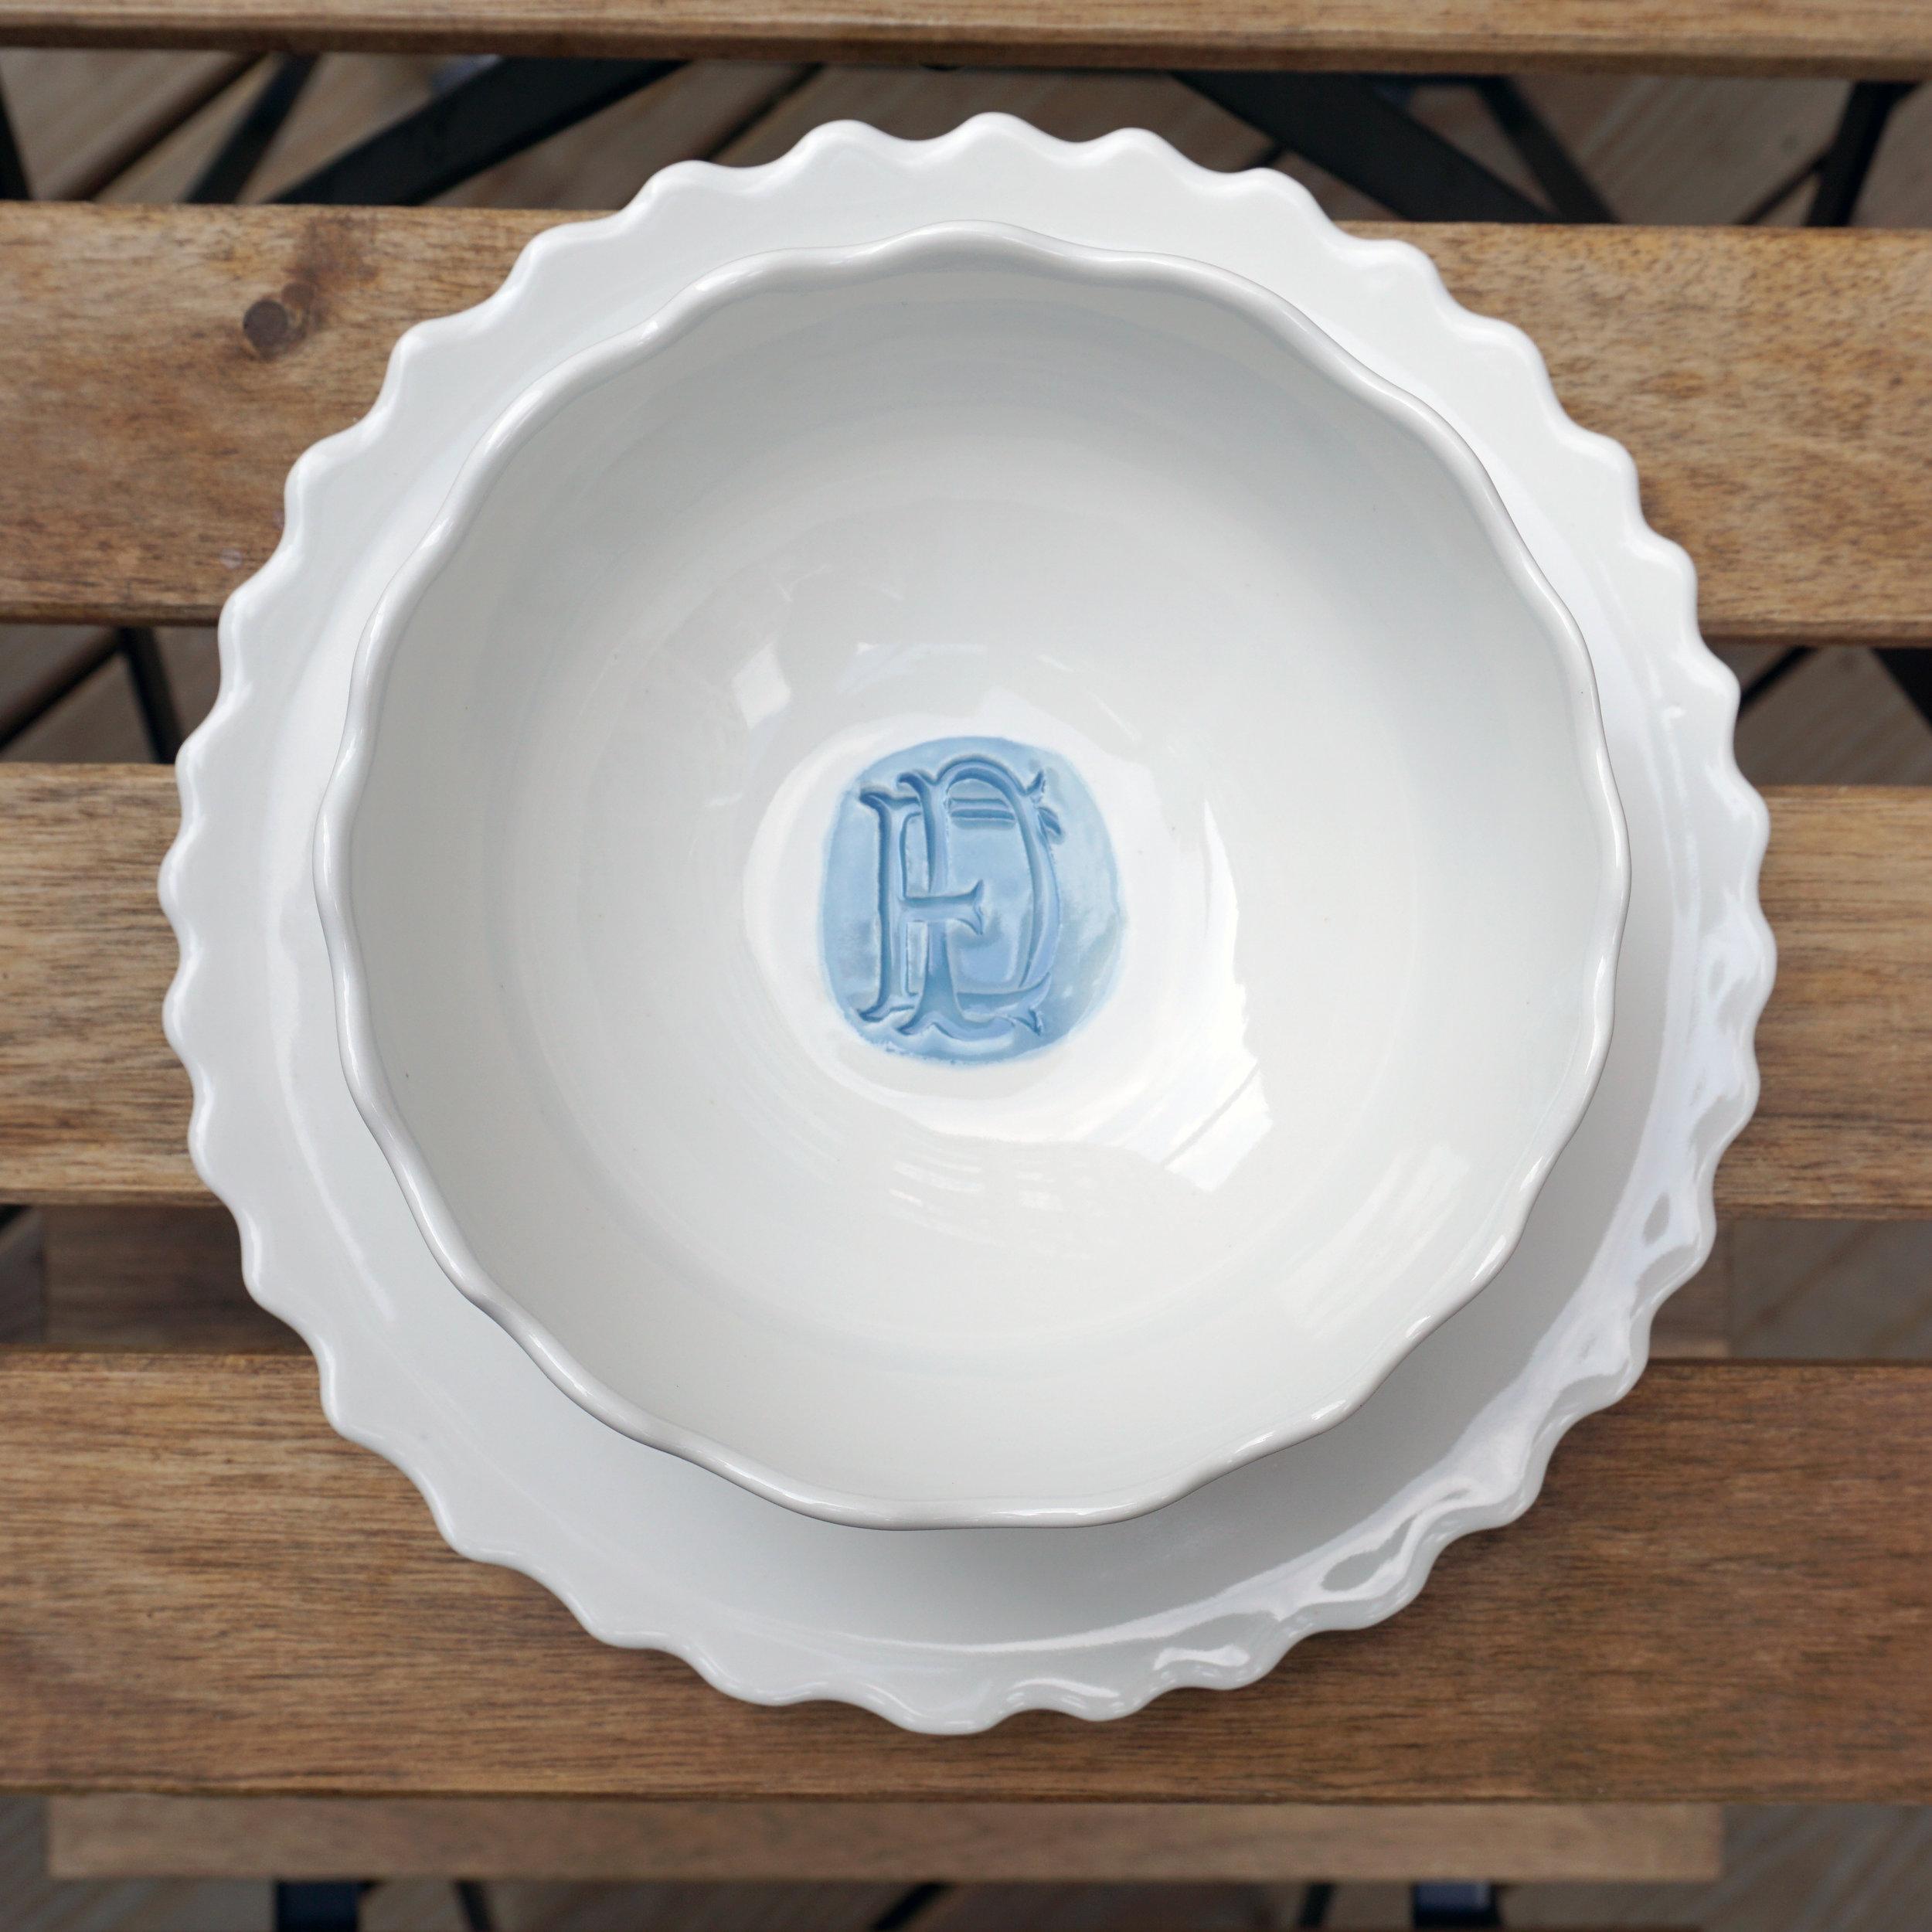 03 bowl plate.jpg